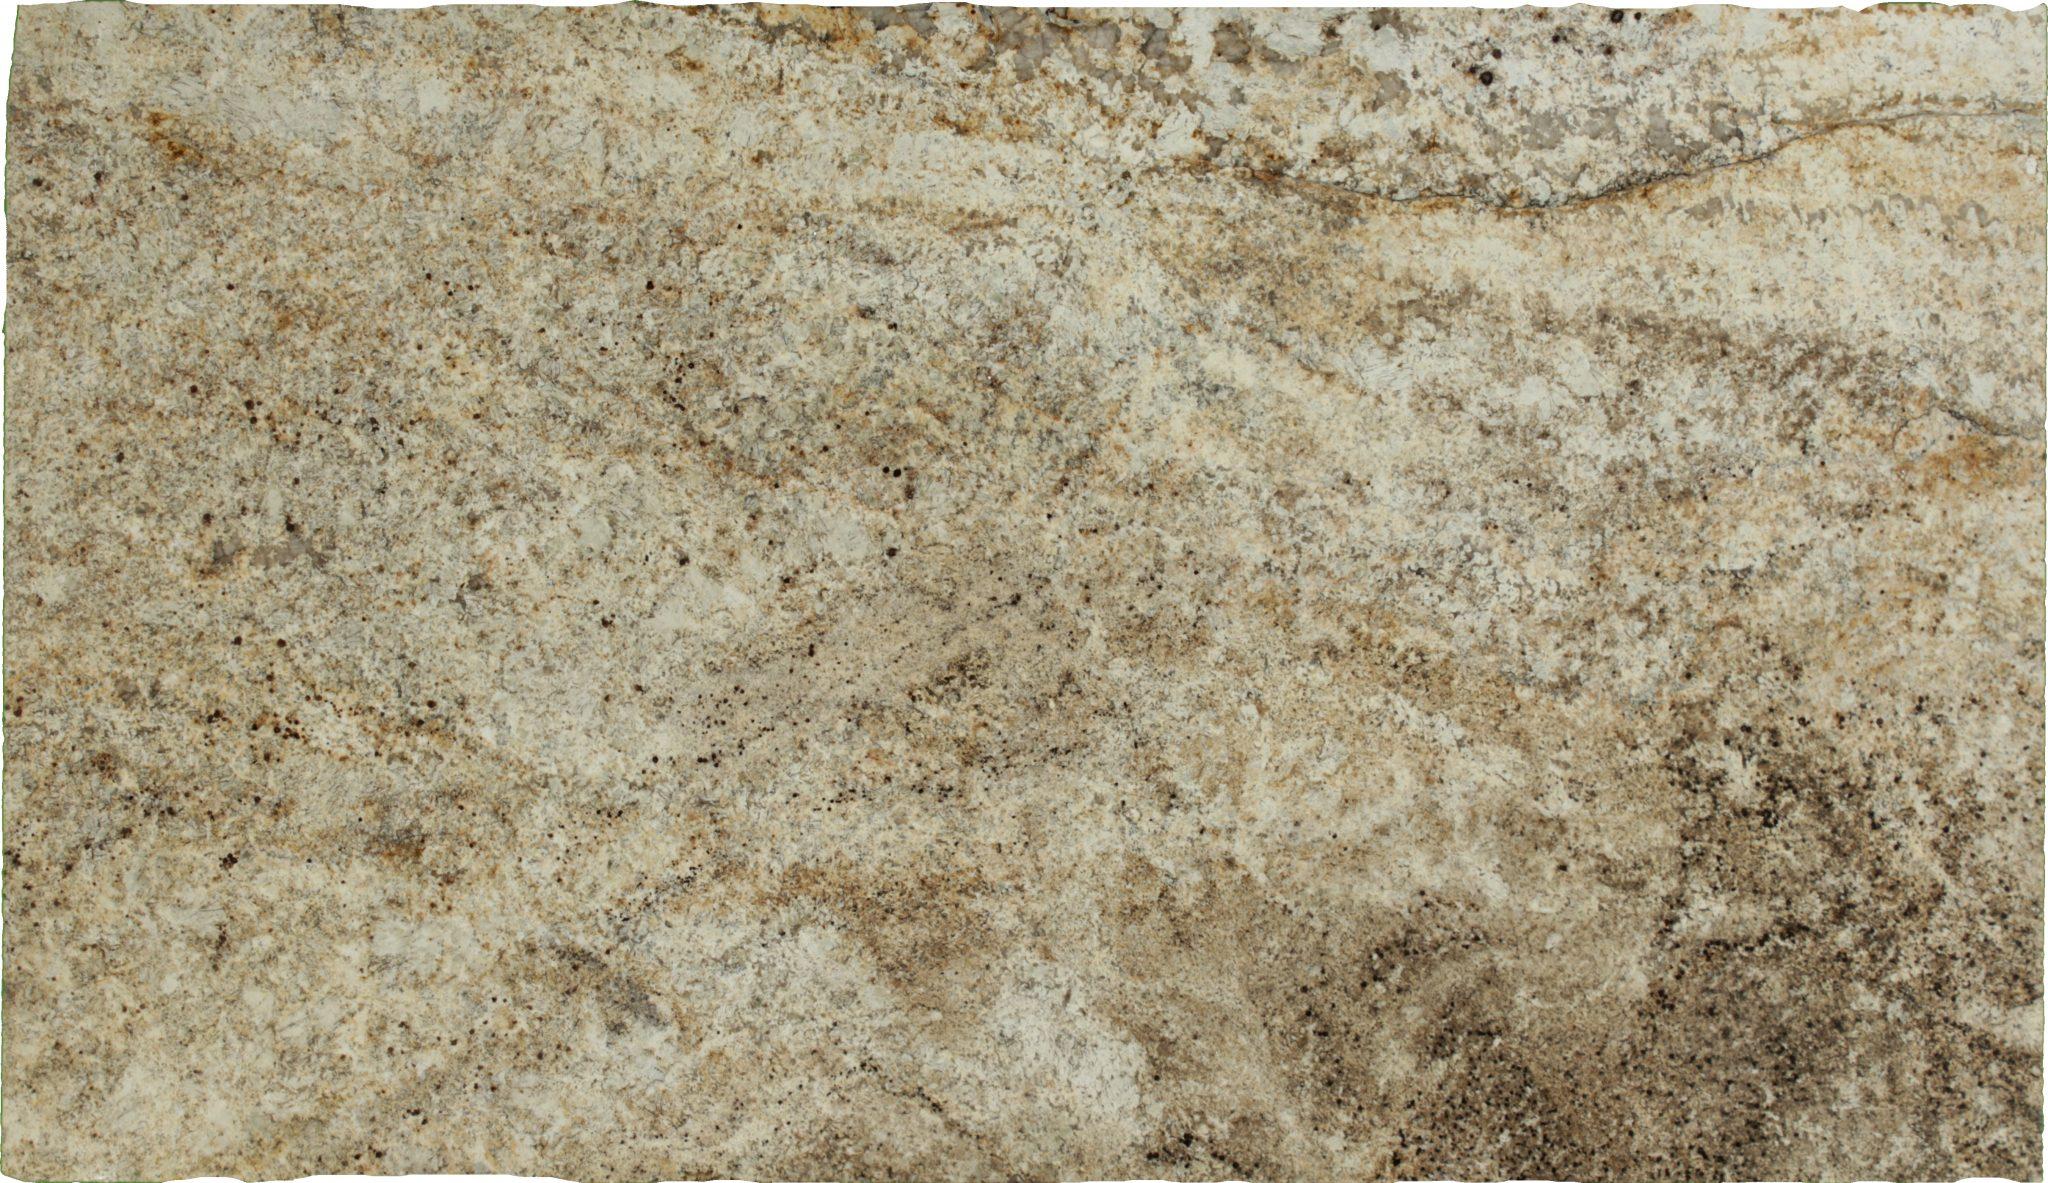 Best Granite Colonial G Colonial G Granite Counter Solutions Slab Inventory Colonial G Granite Slab Price Colonial G Granite Price Level Image houzz 01 Colonial Gold Granite